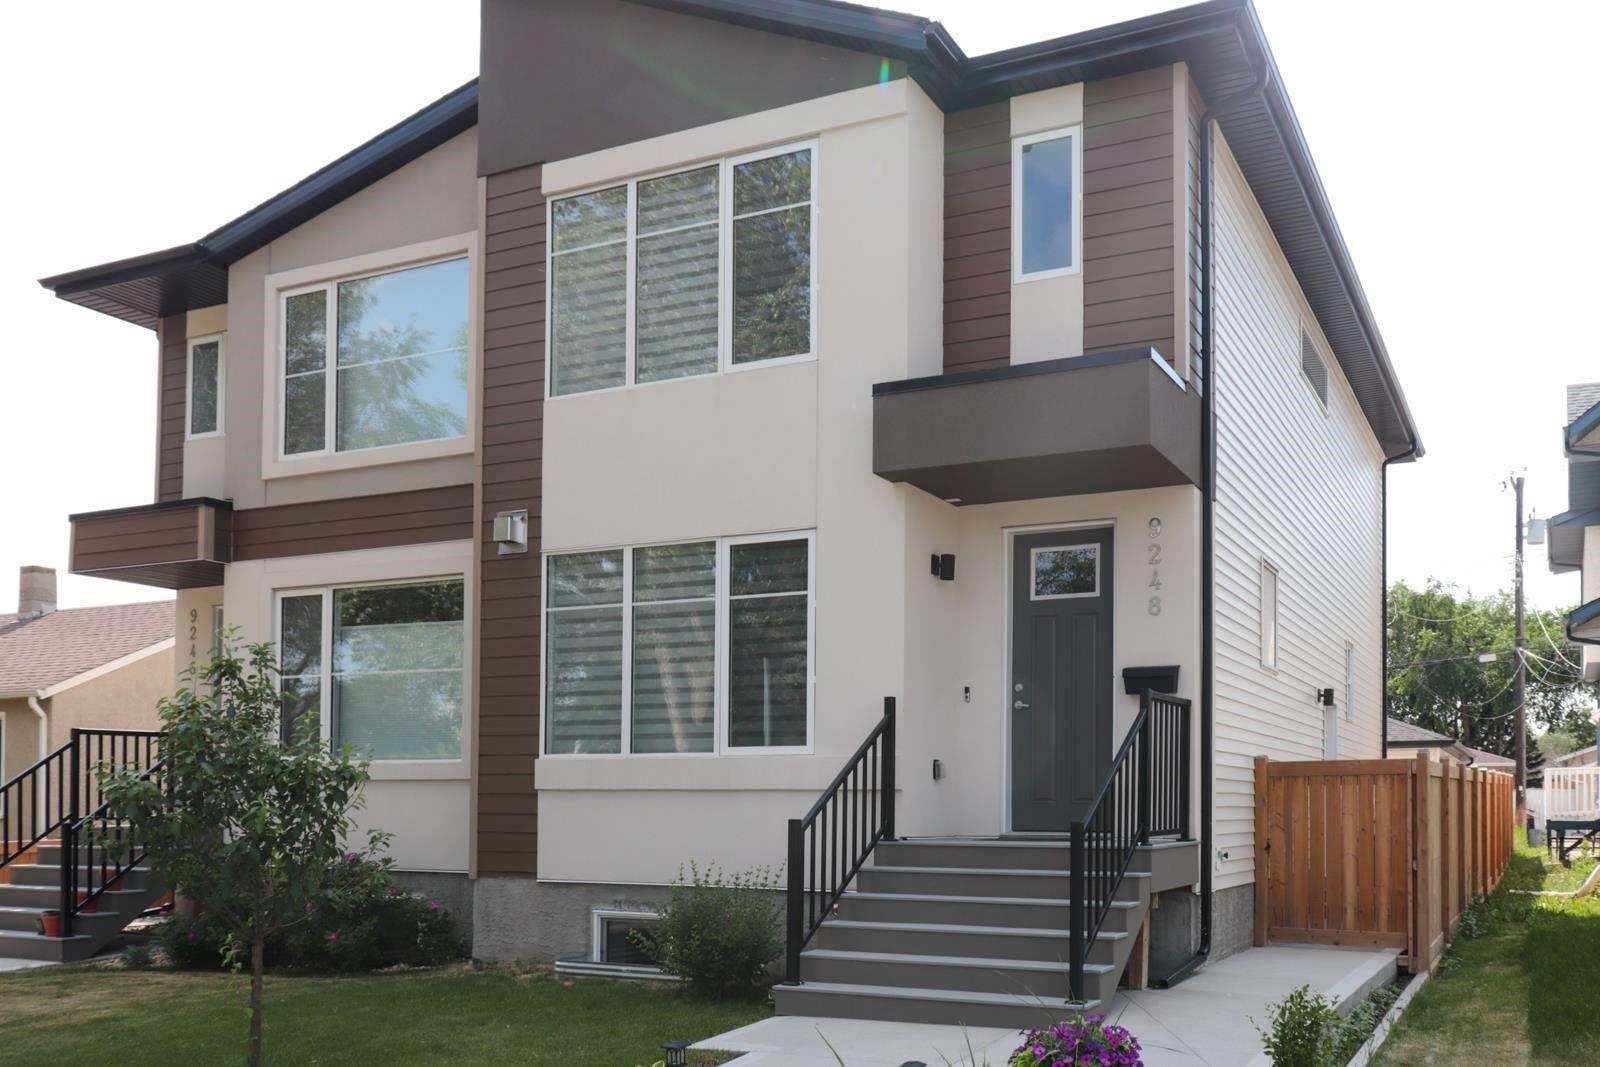 Main Photo: 9248 90 Street in Edmonton: Zone 18 House Half Duplex for sale : MLS®# E4252934